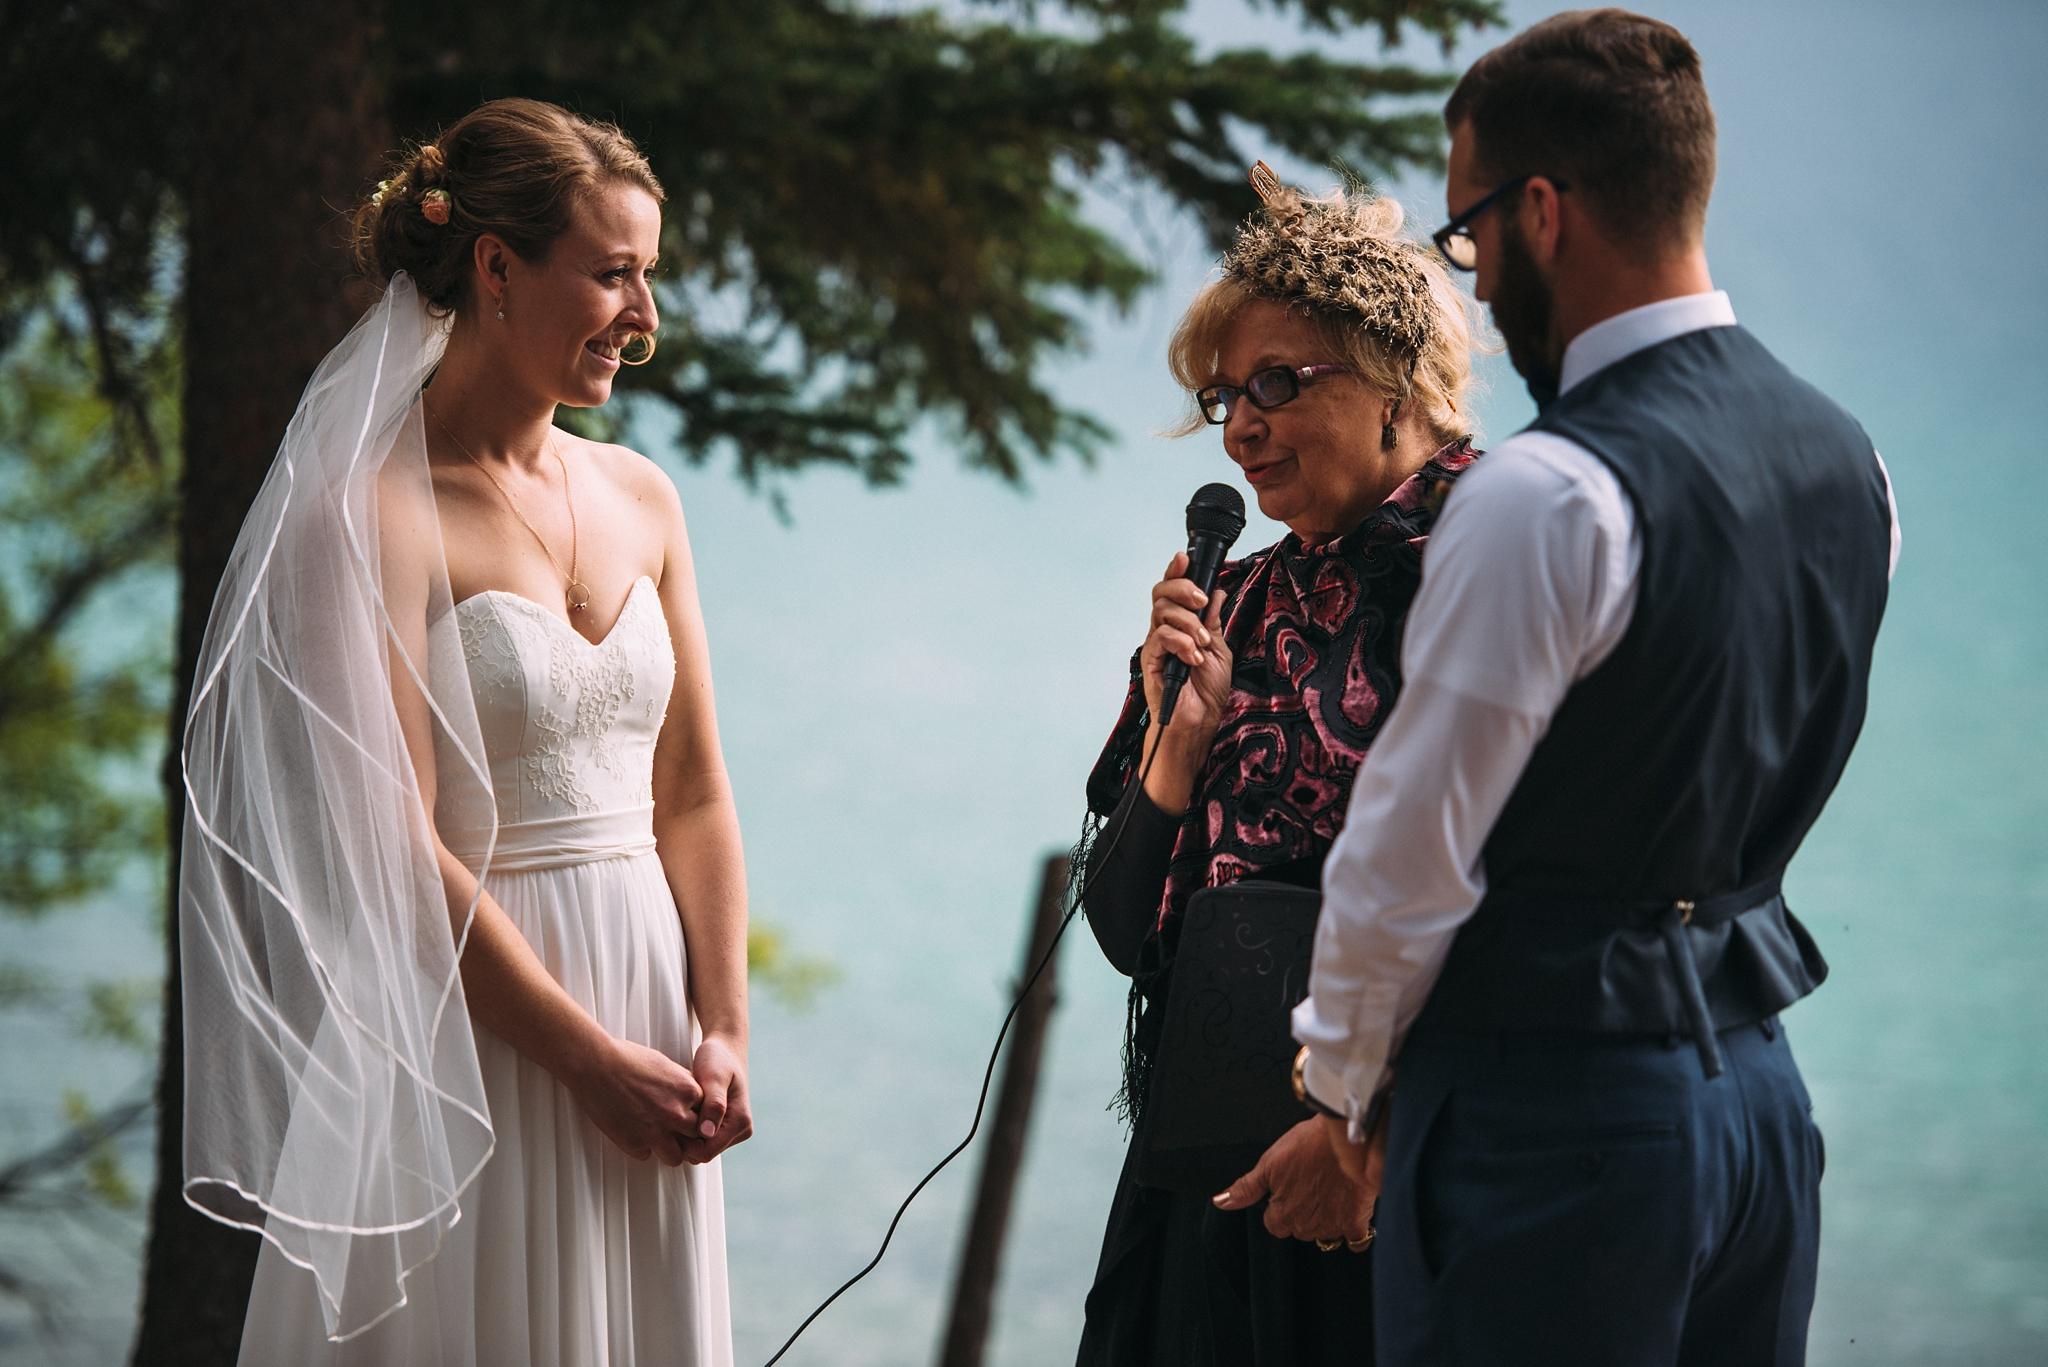 kaihla_tonai_intimate_wedding_elopement_photographer_2520